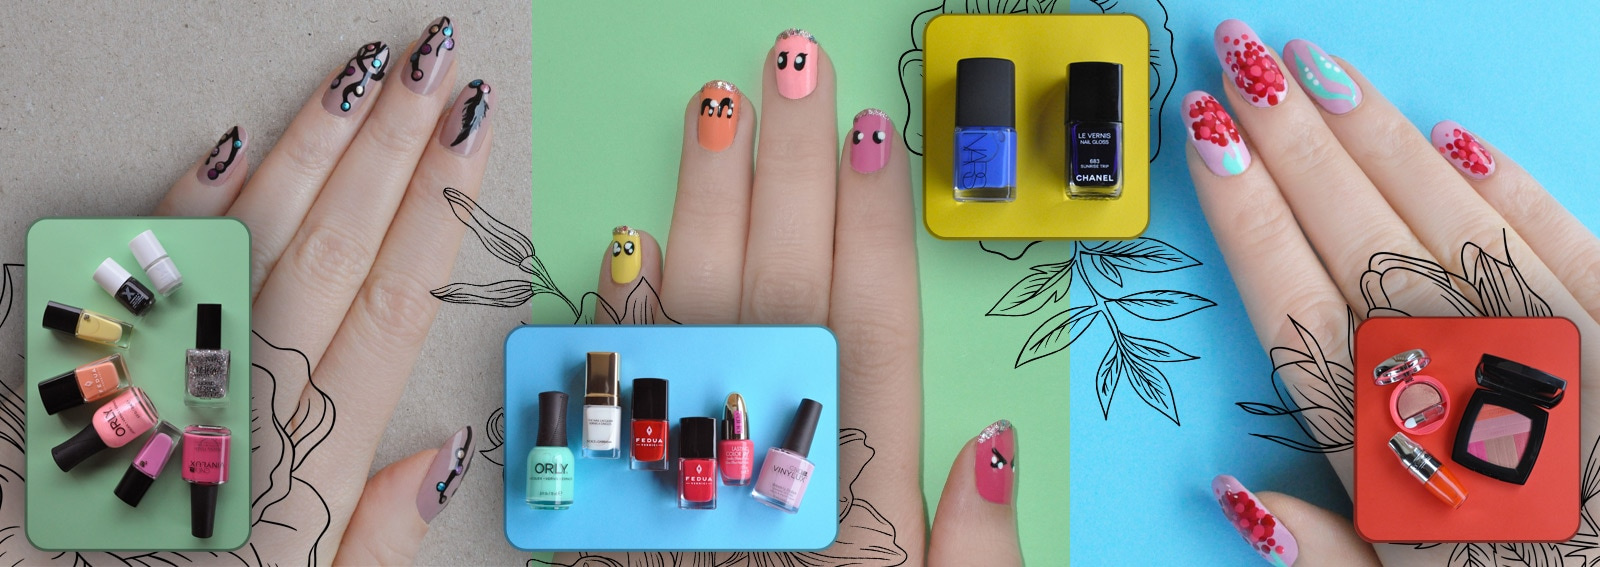 cover-le-nail-art-di-nonsolokawaii-desktop